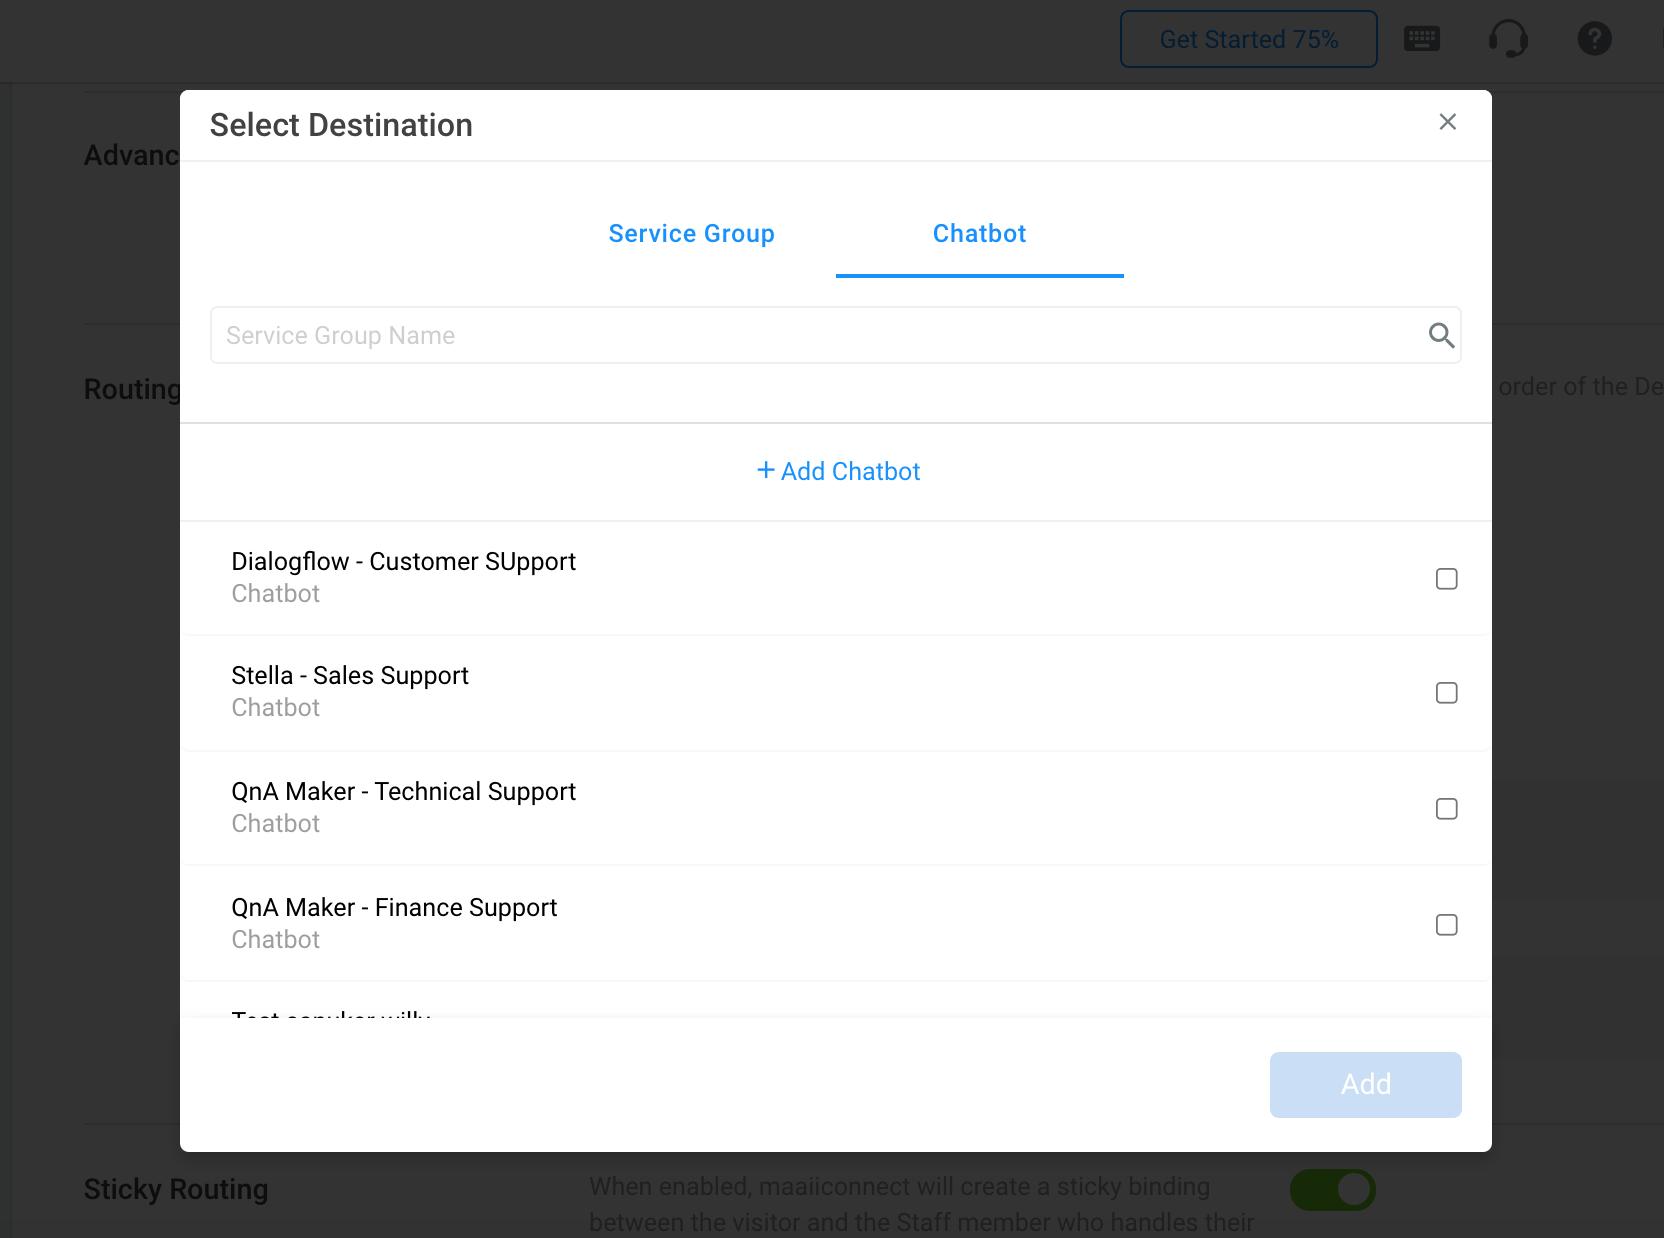 Selecting Chatbot as Destination